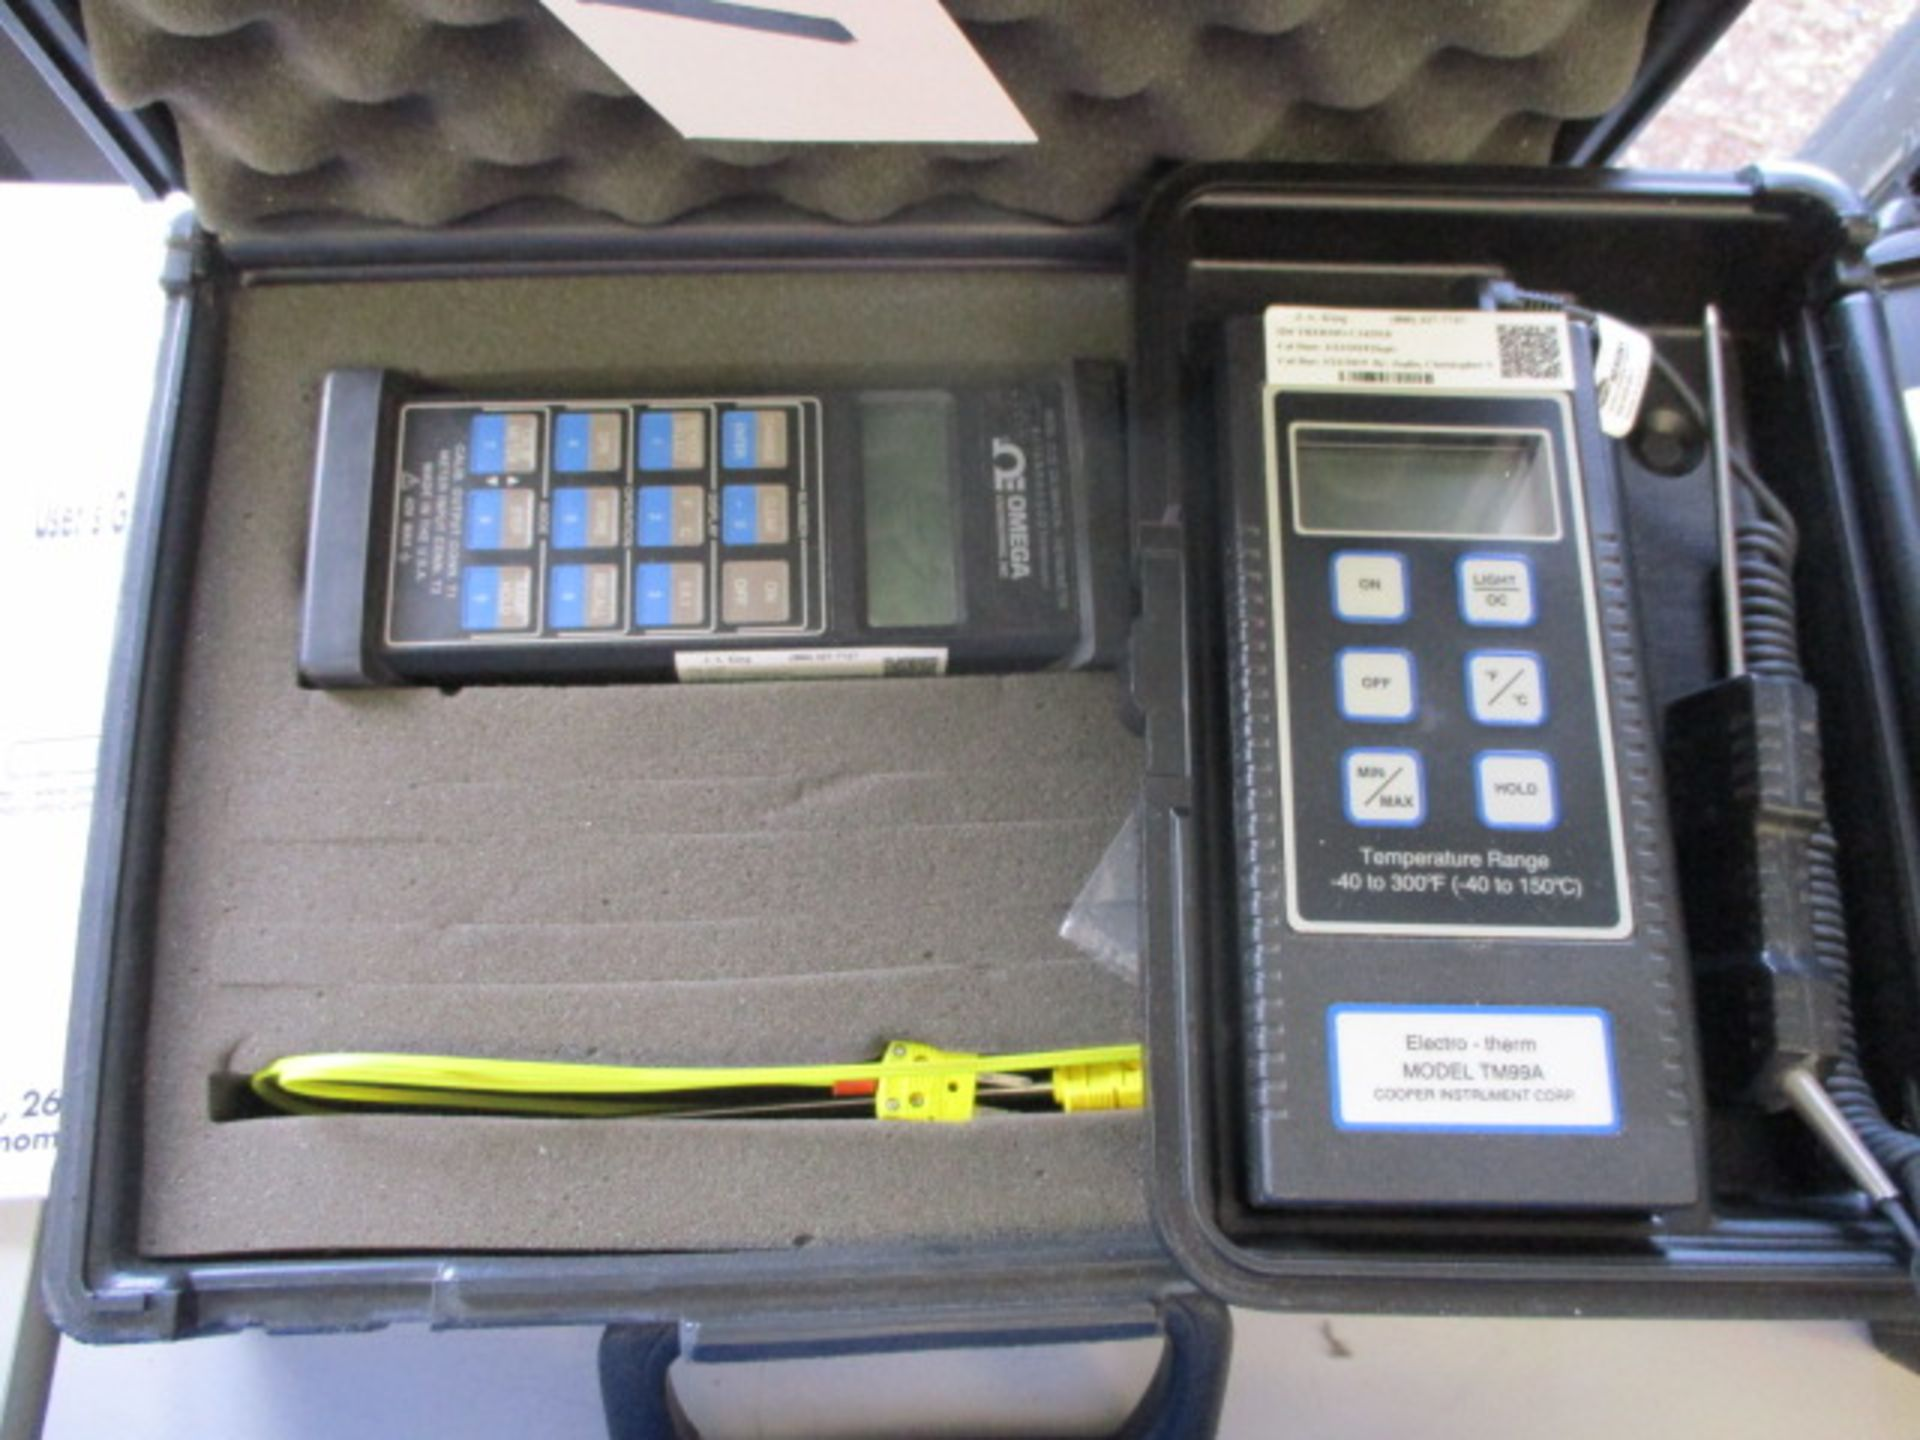 Lot 771 - Omega Calibrator / Thermometer & Cooper Thermometer